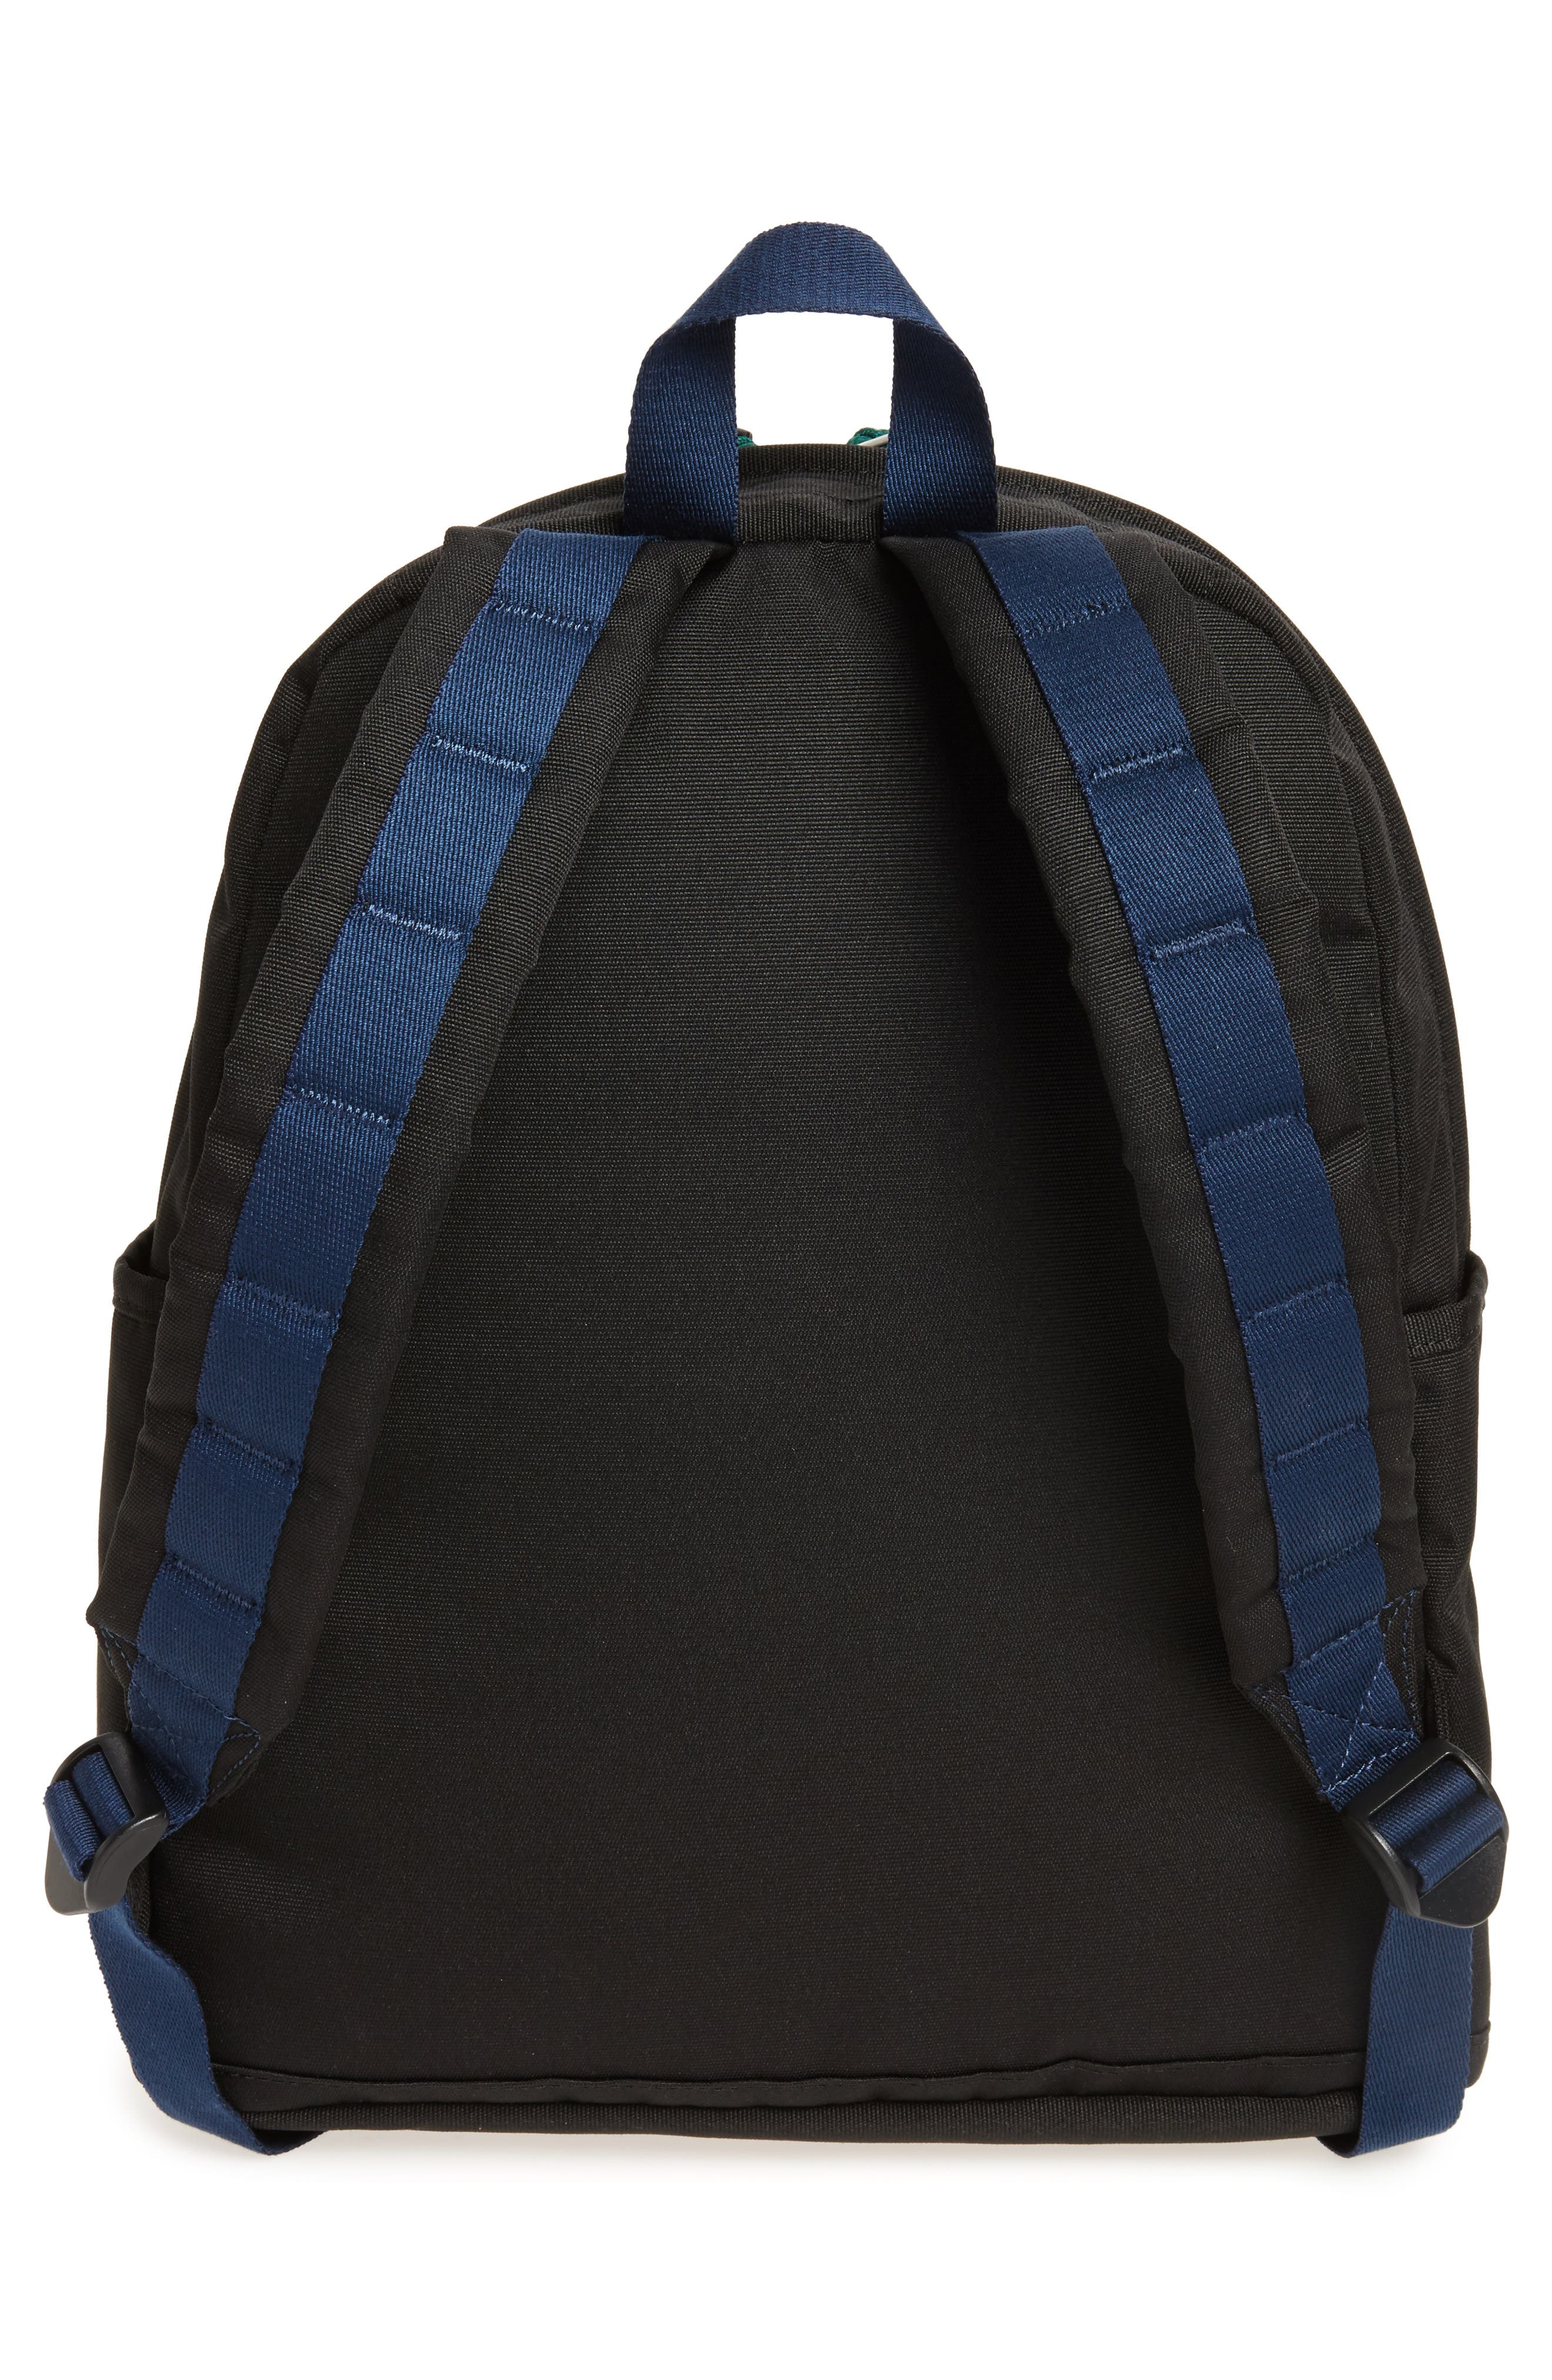 STATE BAGS,                             Kent Backpack,                             Alternate thumbnail 3, color,                             BLACK